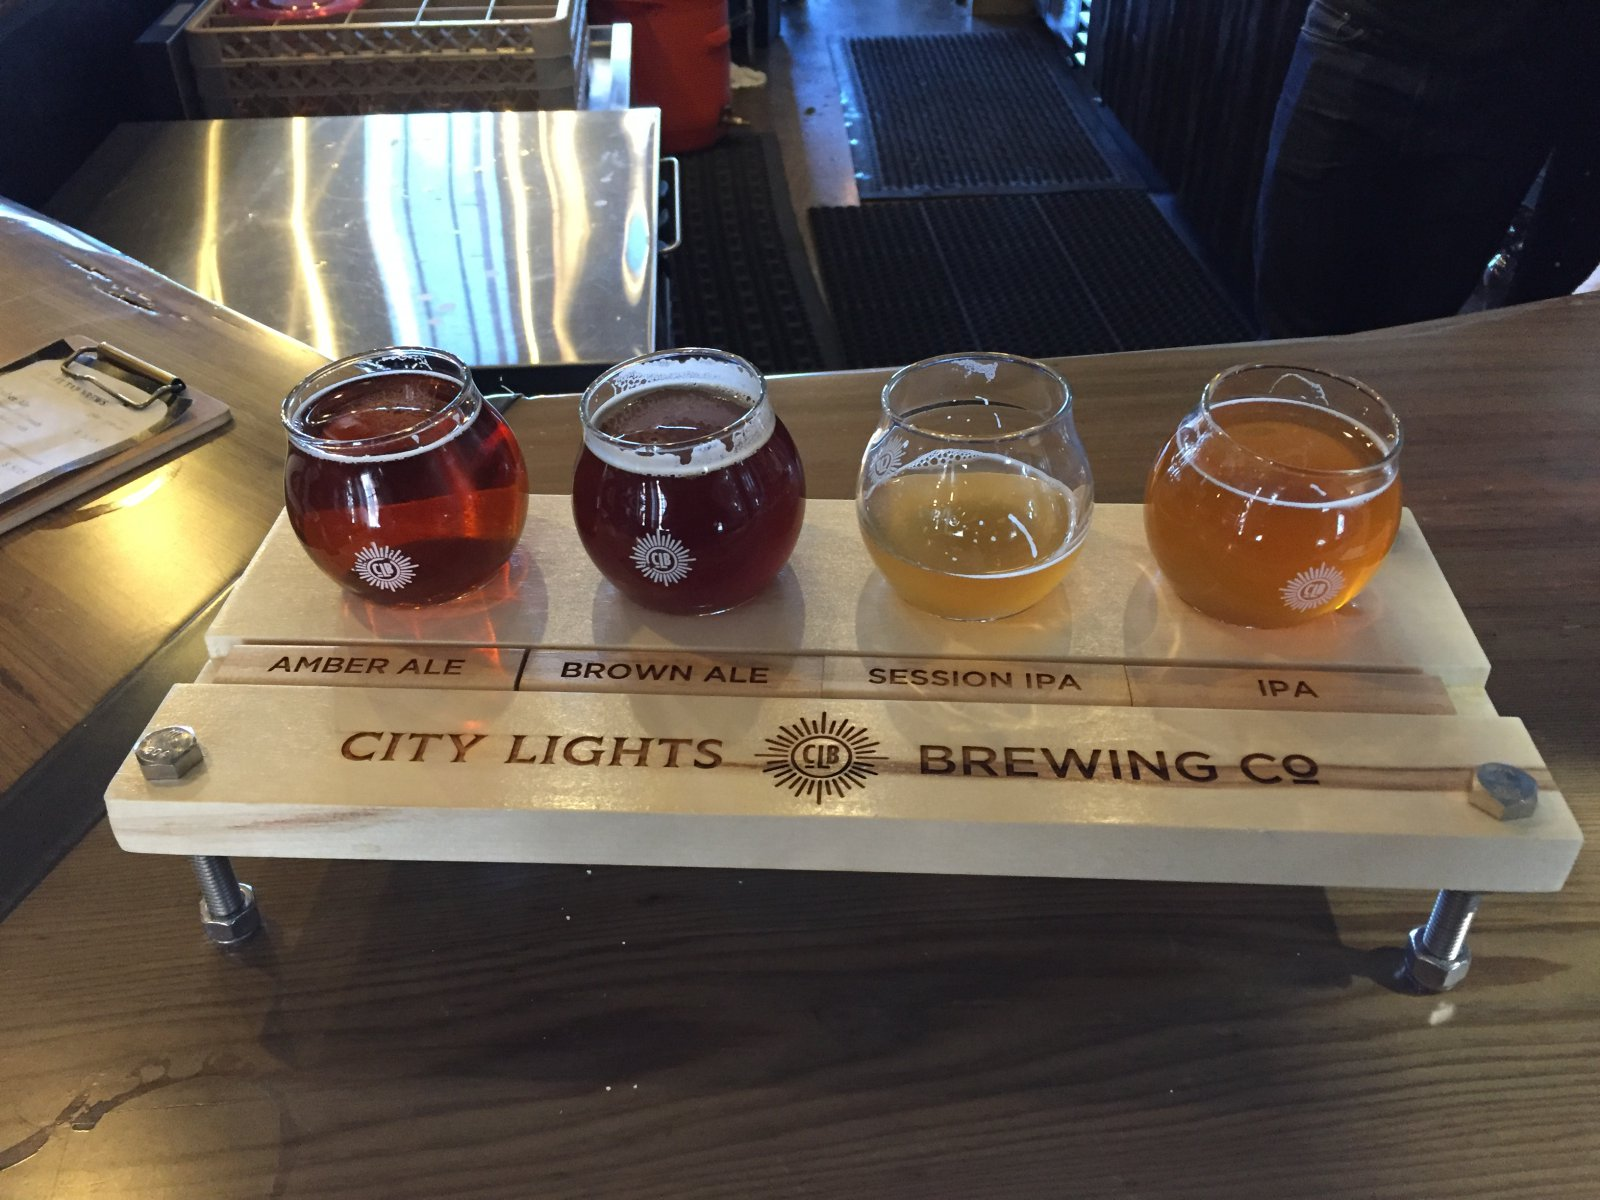 City Lights Brewing Co